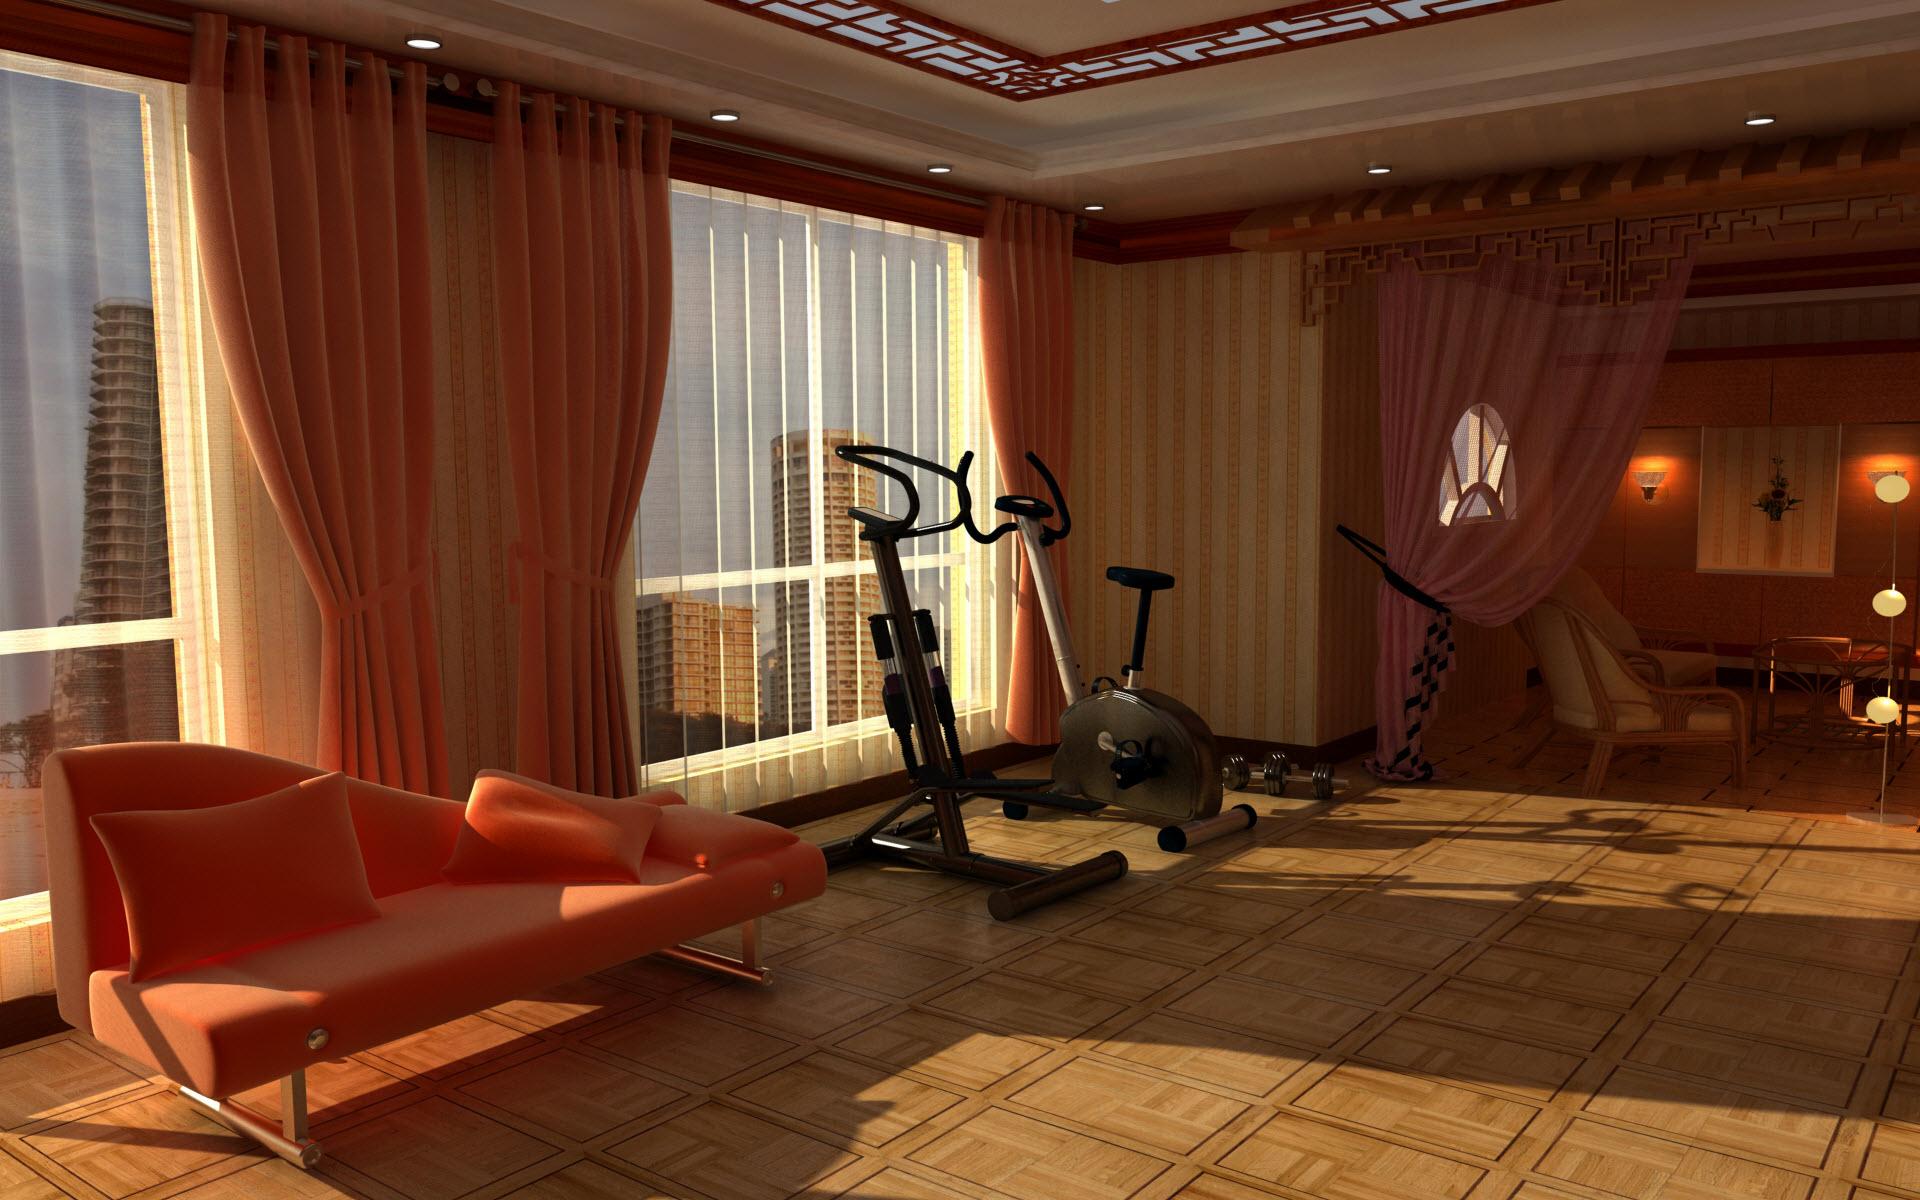 lekova kuca New-Home-Interior-HD-Wallpaper-design-